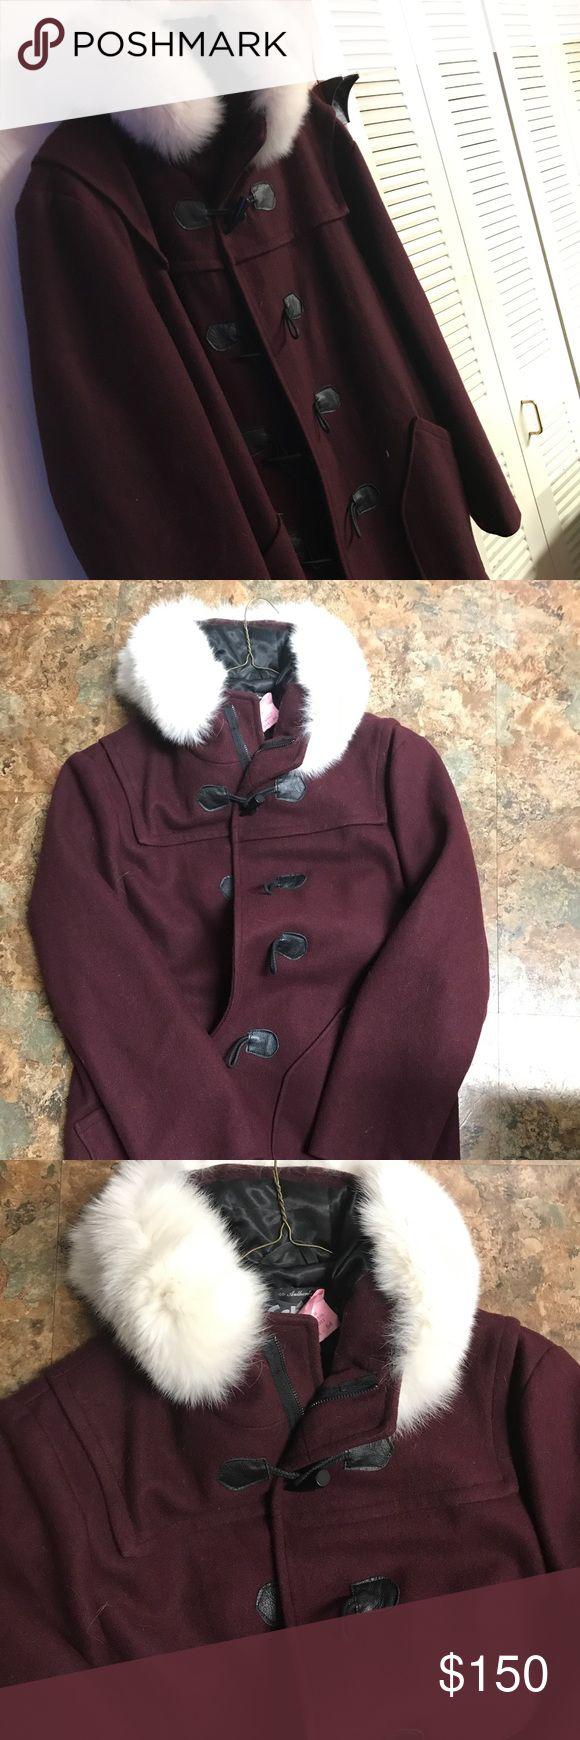 Men's Coat Burgundy wool white faux fur collar wooden buttons Schott NYC Jackets & Coats Pea Coats